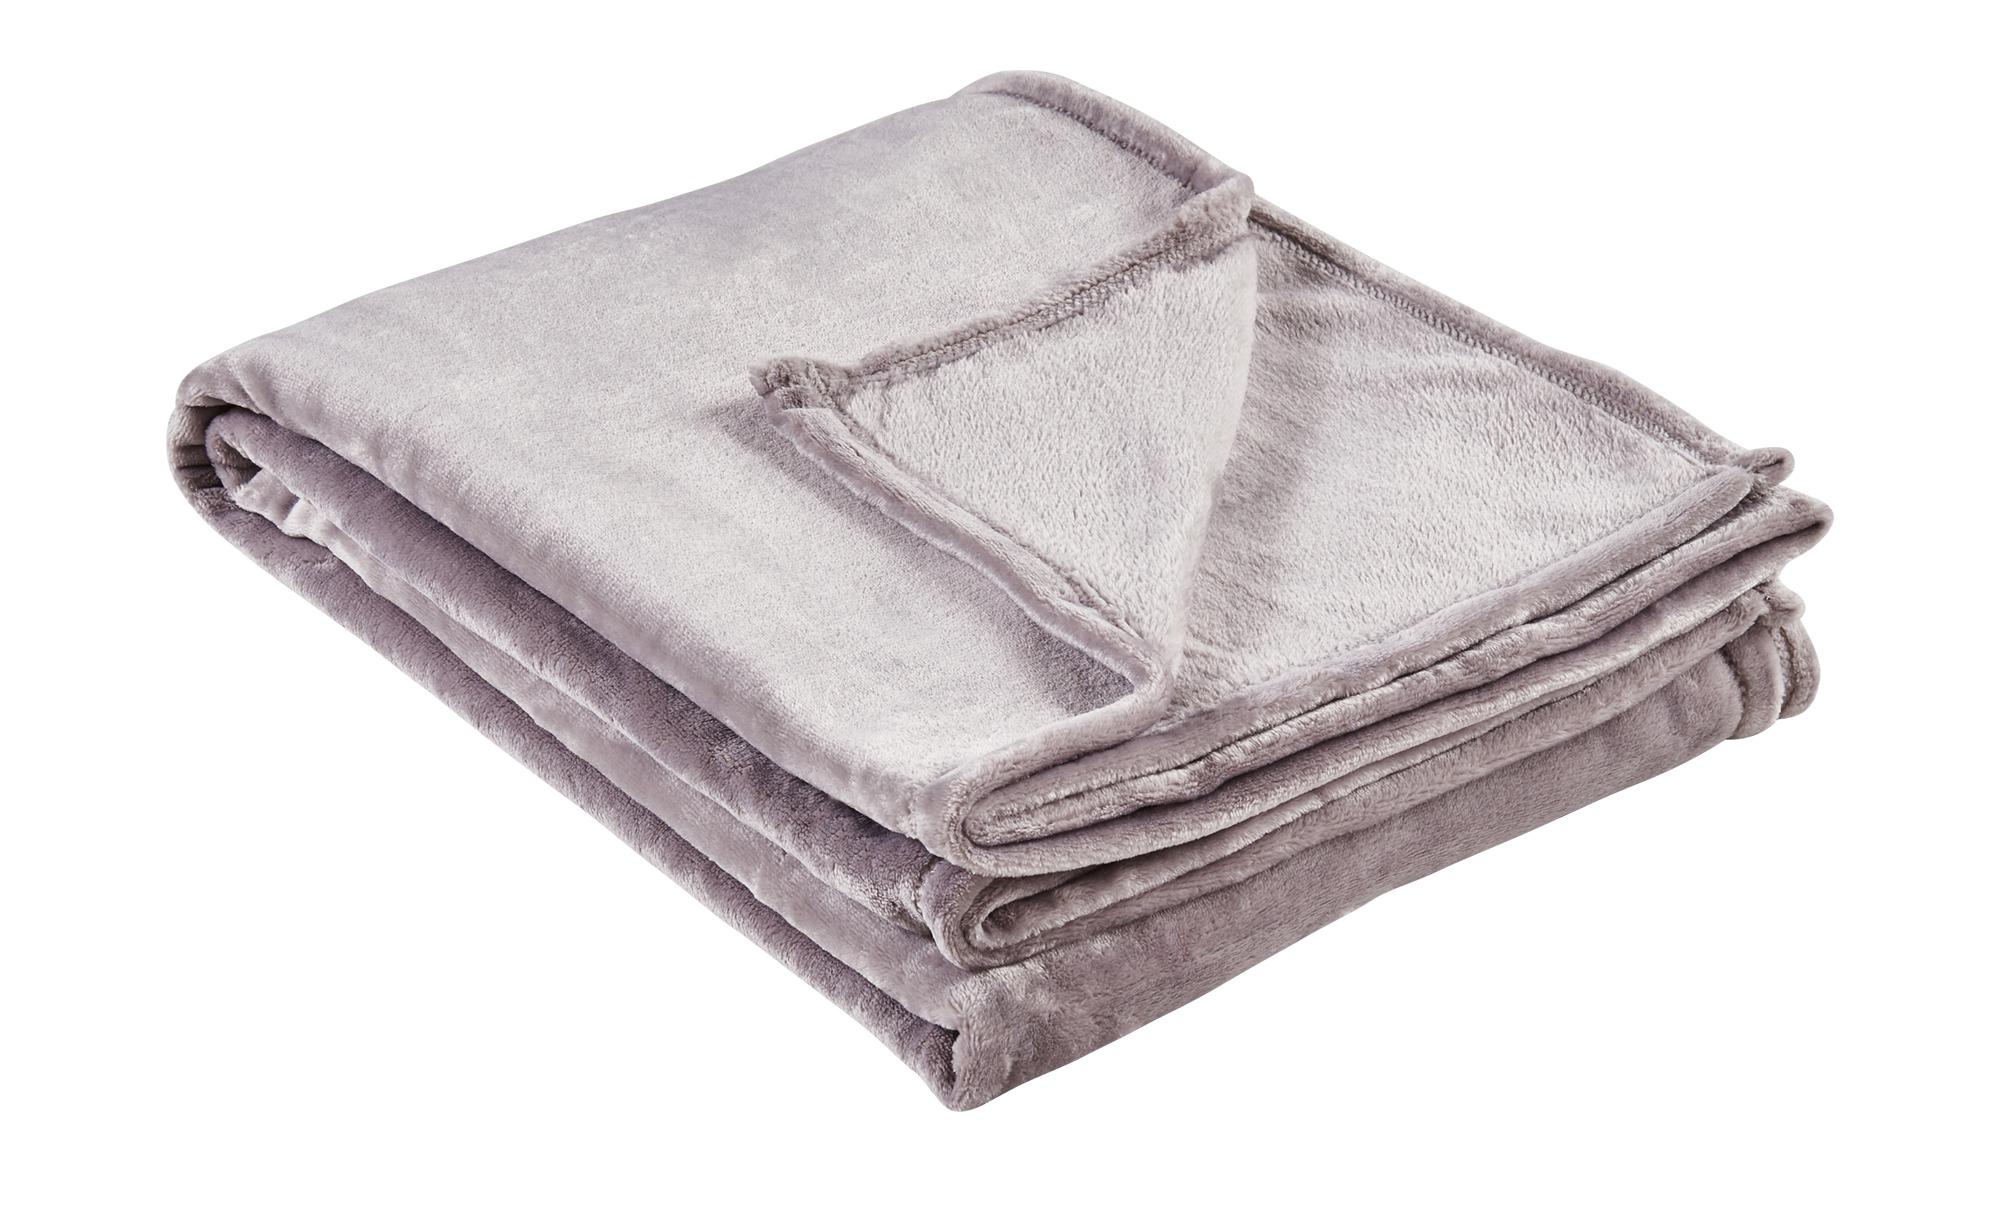 LAVIDA Soft-Flauschdecke  Mirabelle ¦ grau ¦ 100% Polyester ¦ Maße (cm): B: 150 Heimtextilien > Kuscheldecken - Höffner